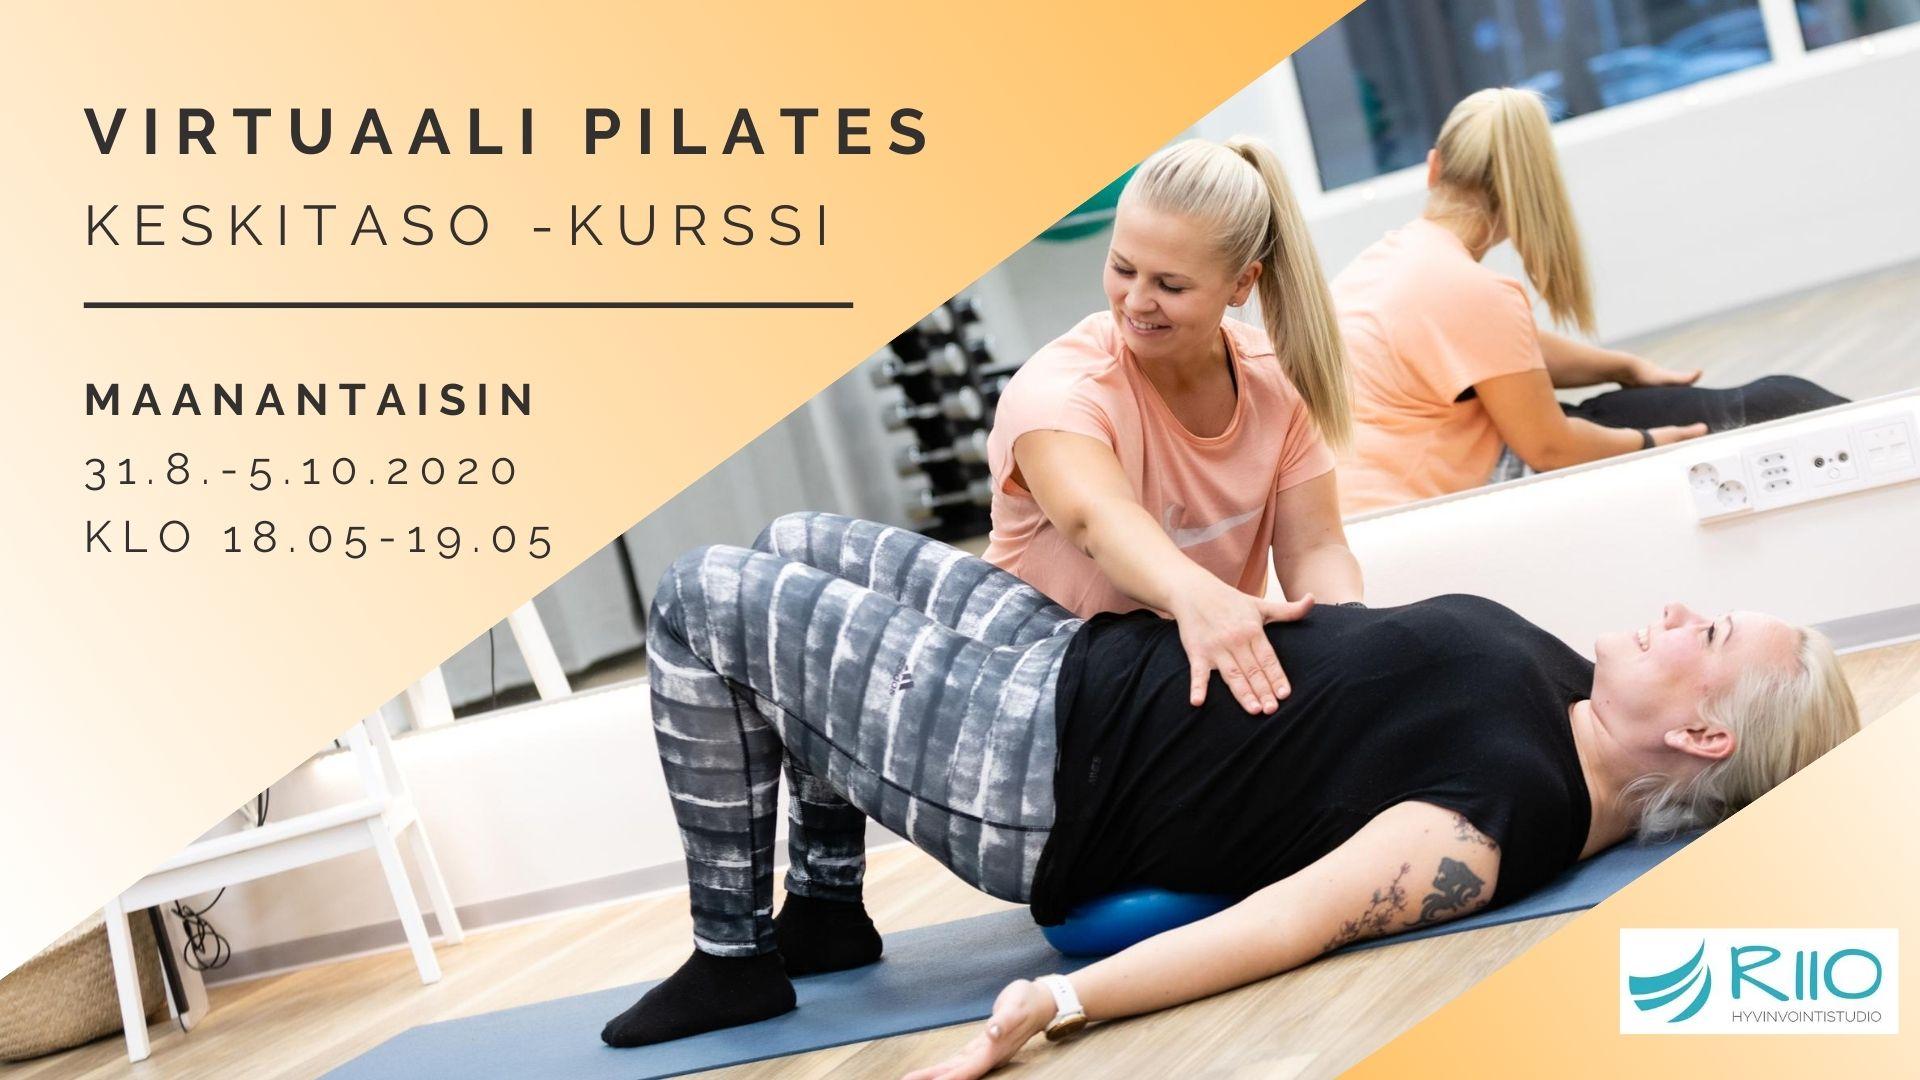 Kertamaksu: Virtuaali Pilates 5.10.2020